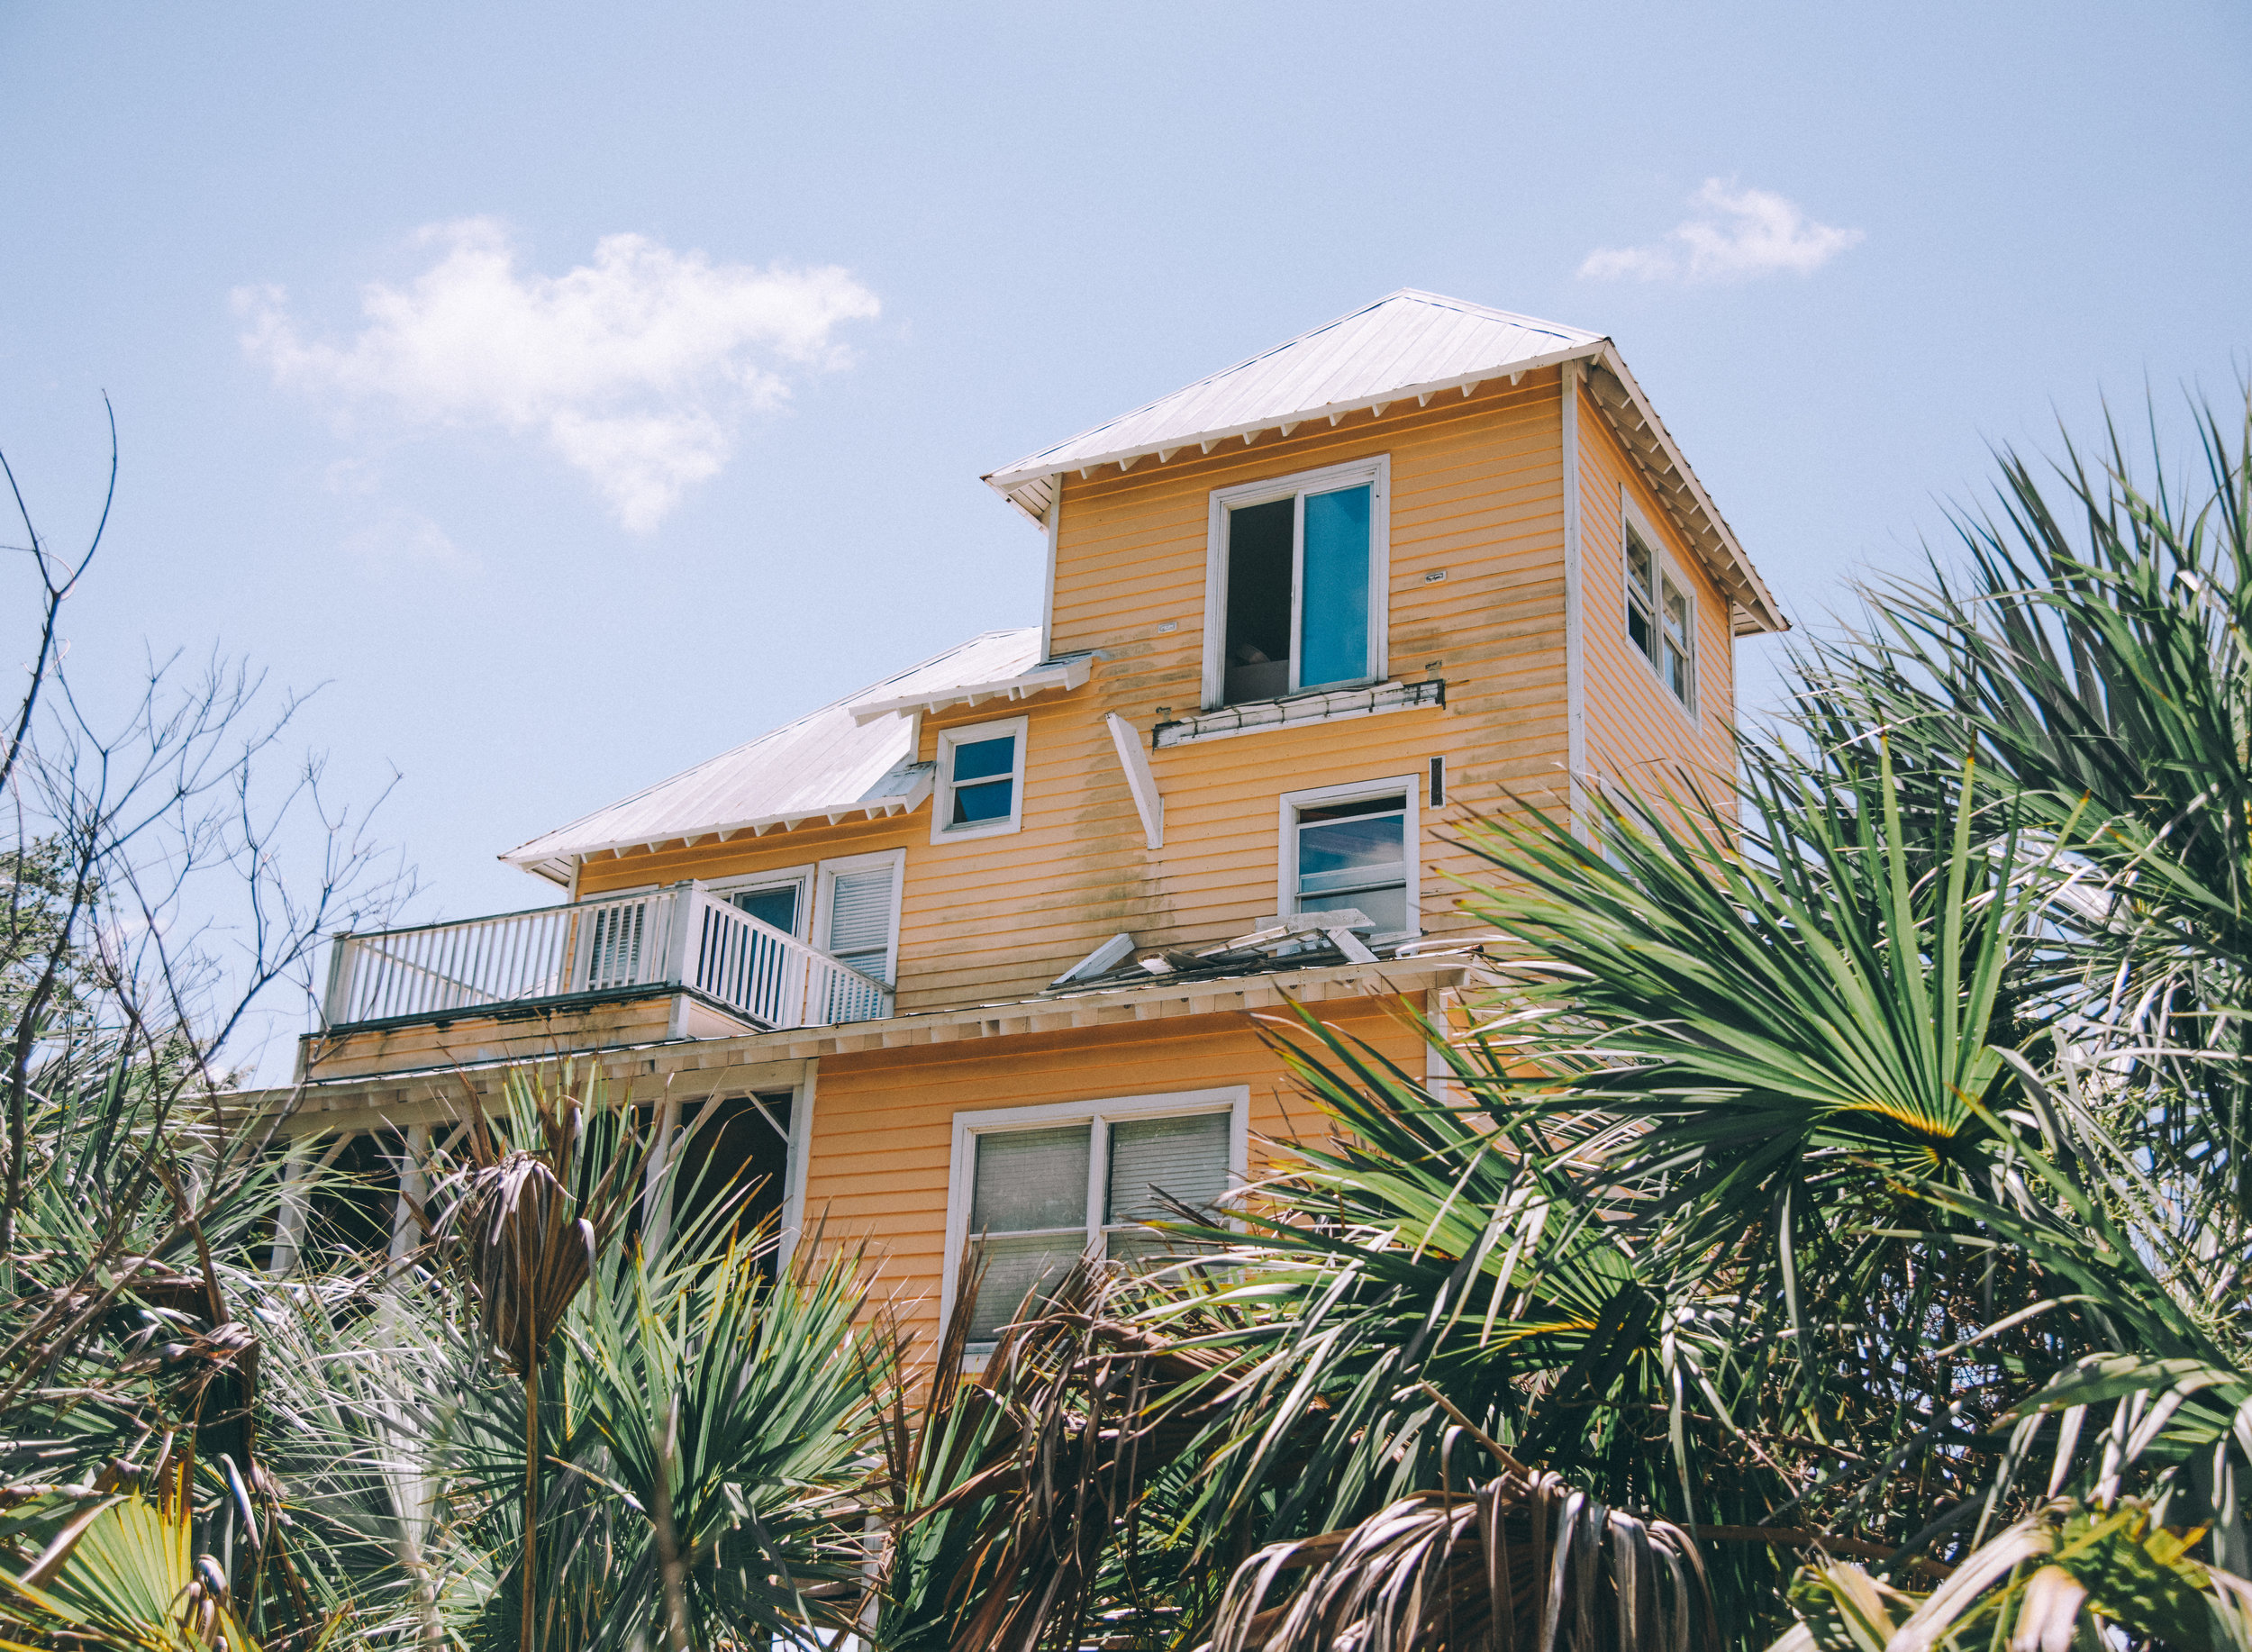 kw-abandoned-beachfront-homes-sc-img8.jpg